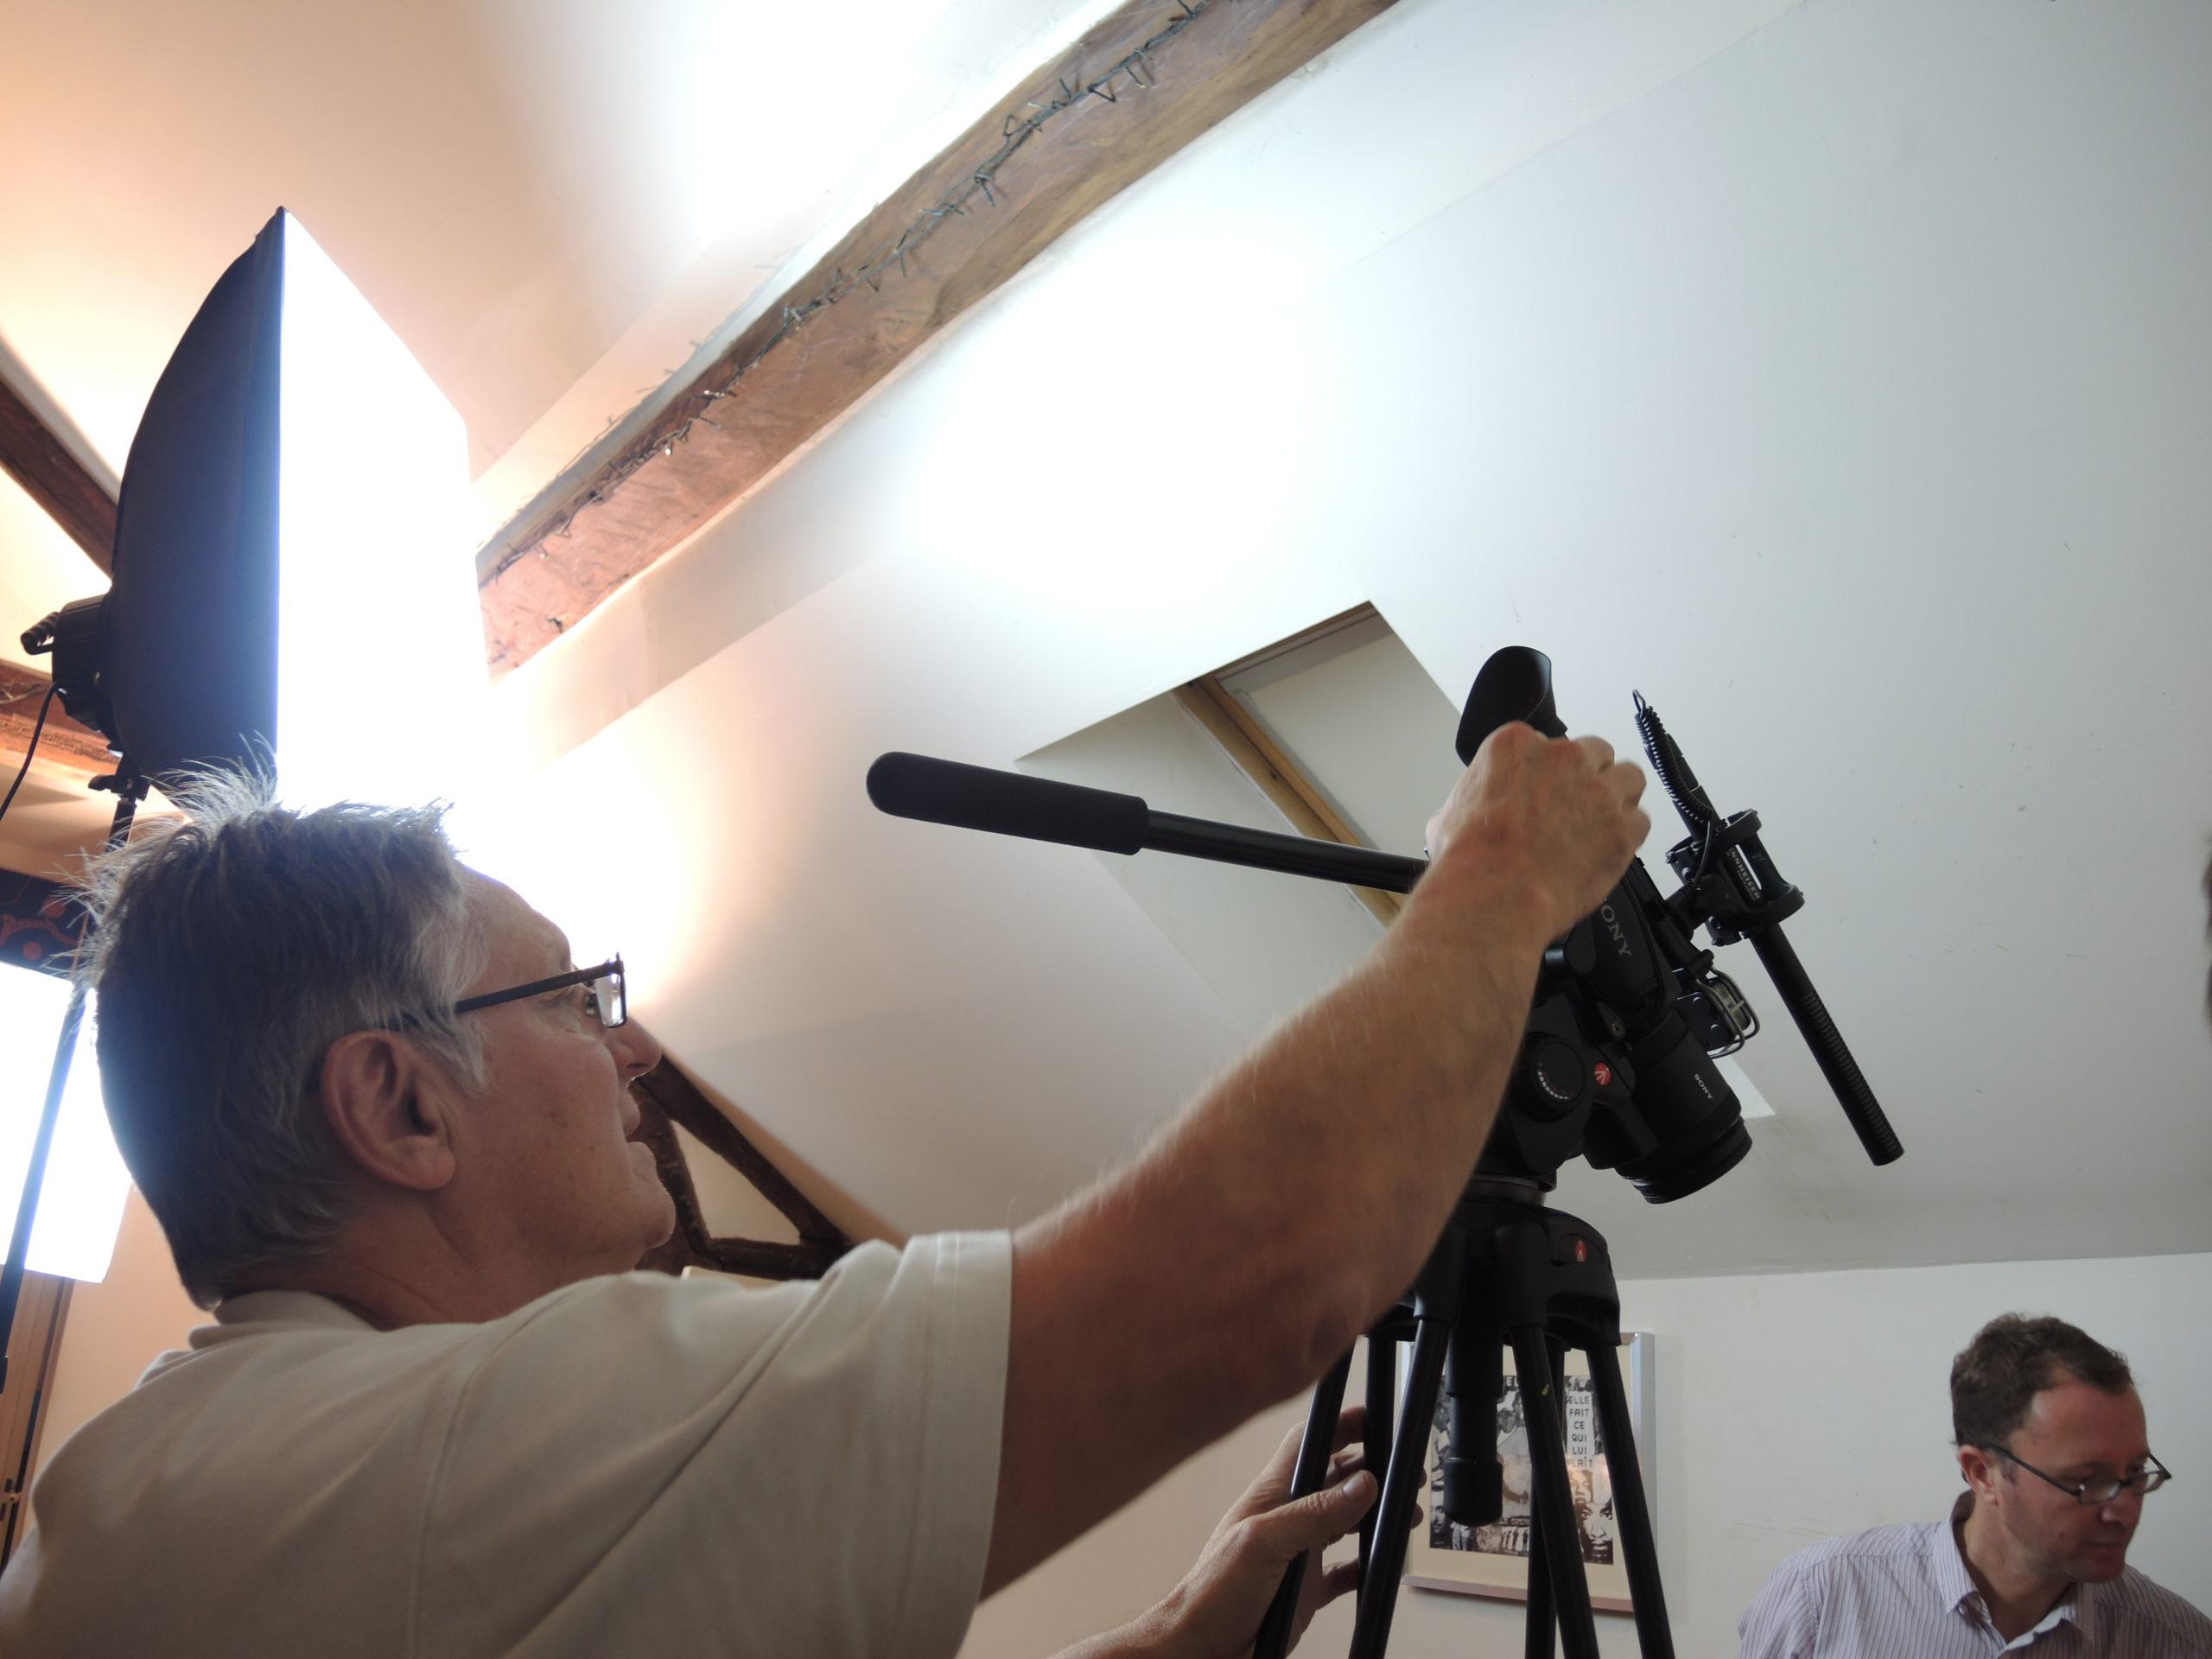 Game over photos tournage 21